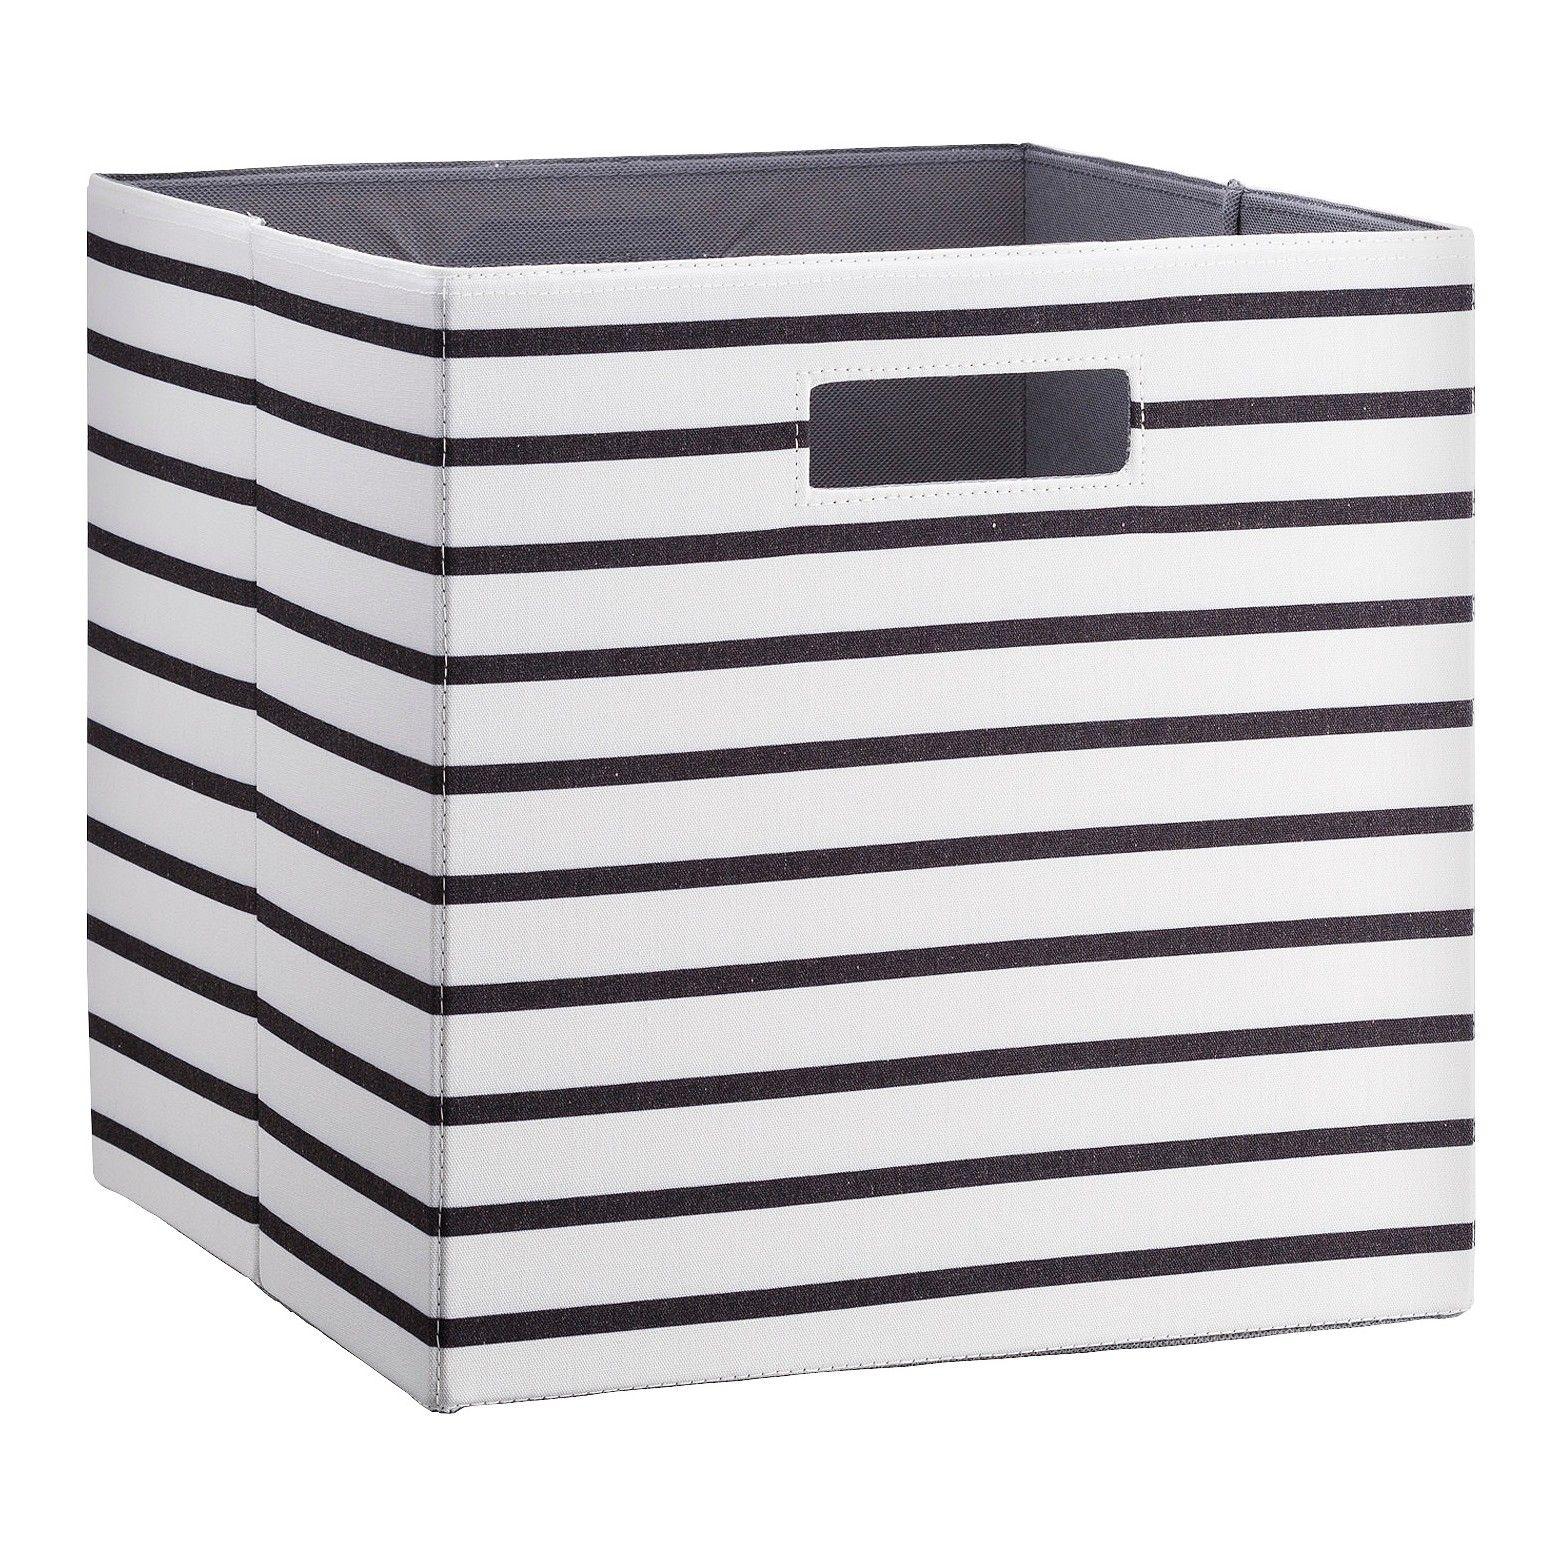 Fabric Cube Storage Bin White Black Stripe 13 Threshold Cube Storage Bins Fabric Storage Bins Fabric Storage Cubes